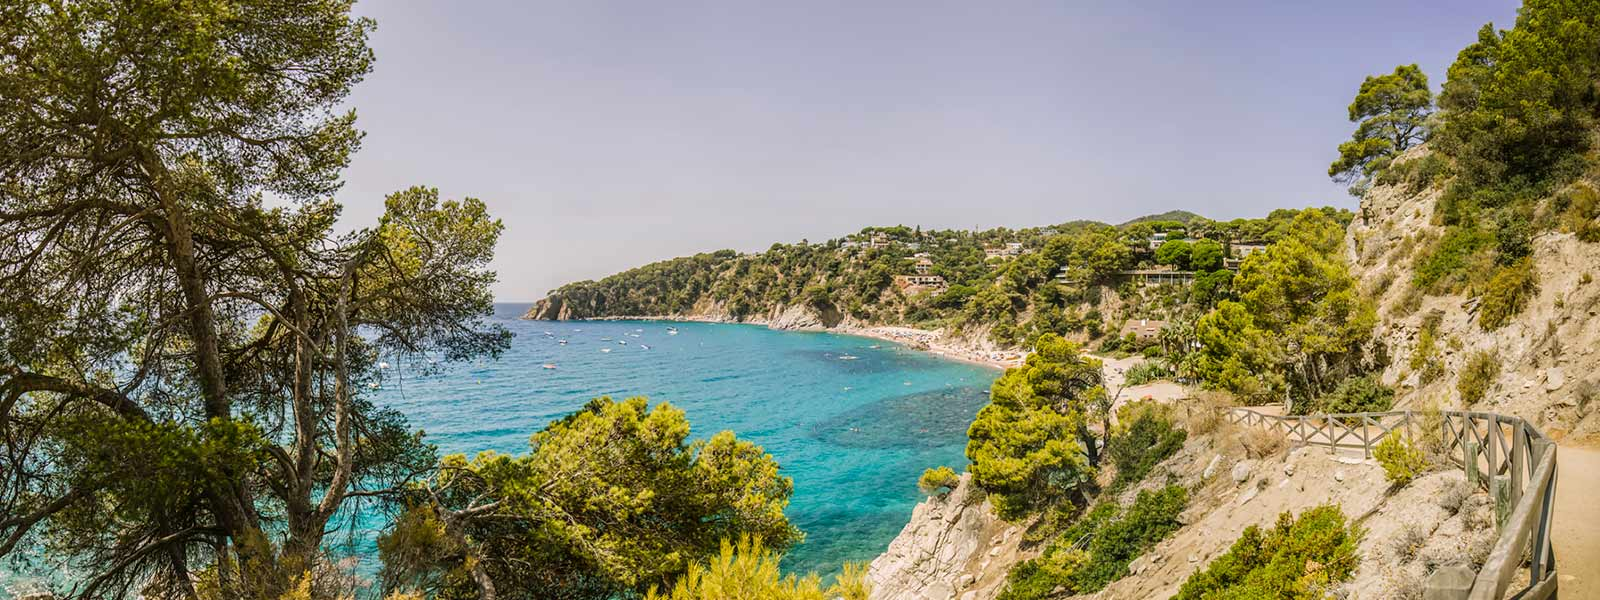 Camping Costa Brava En España Camping En Tossa De Mar En